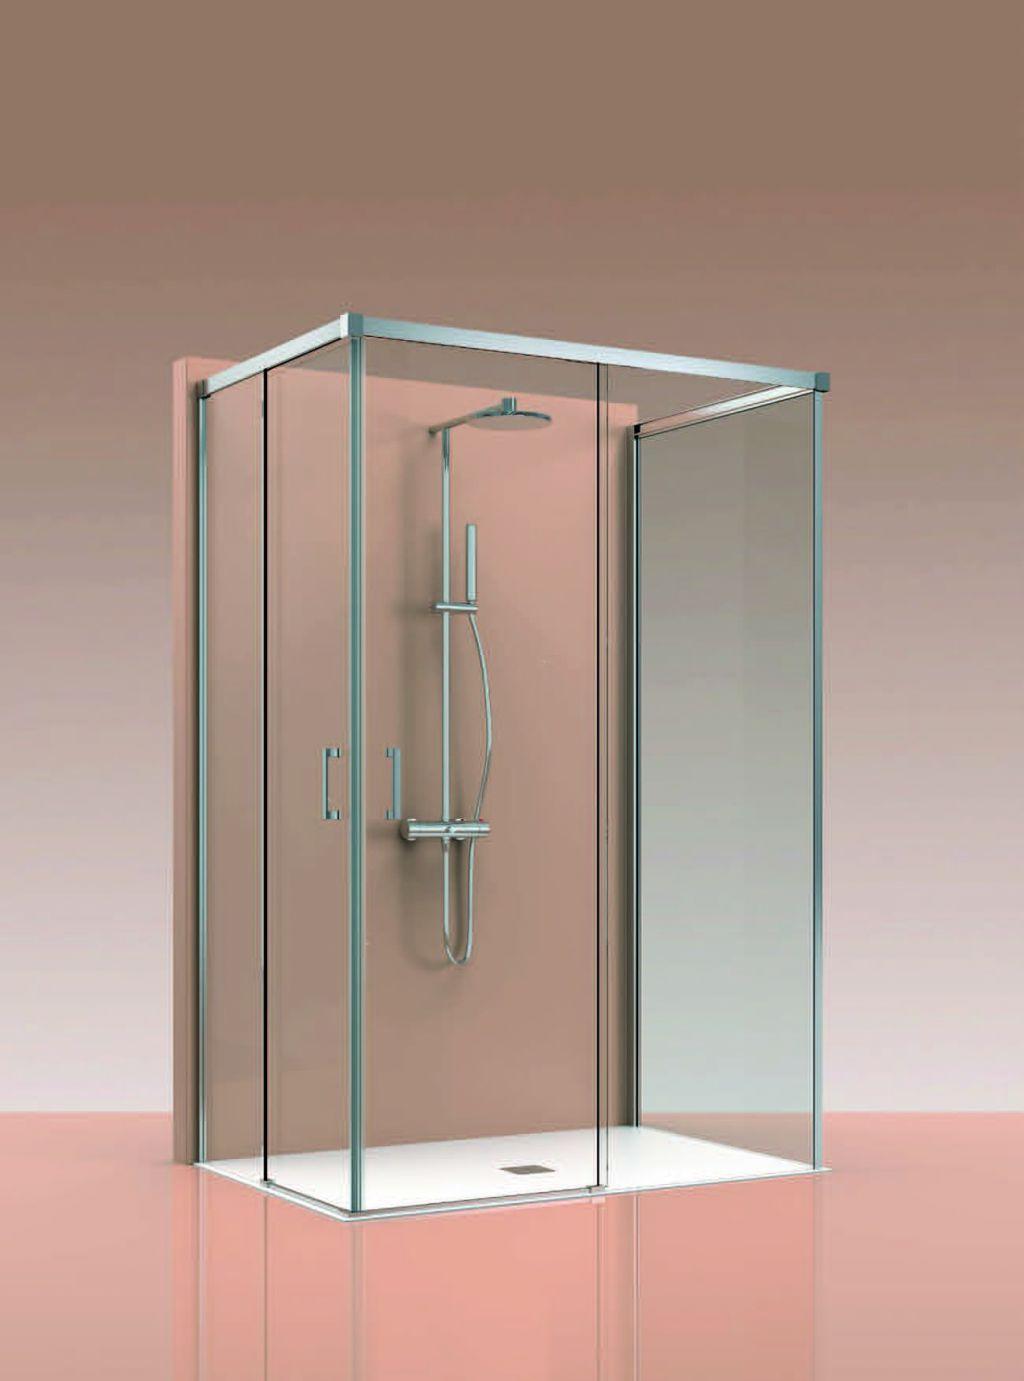 Mampara corredera aluminio la cristaleria de barcelona - Cristaleras de aluminio ...